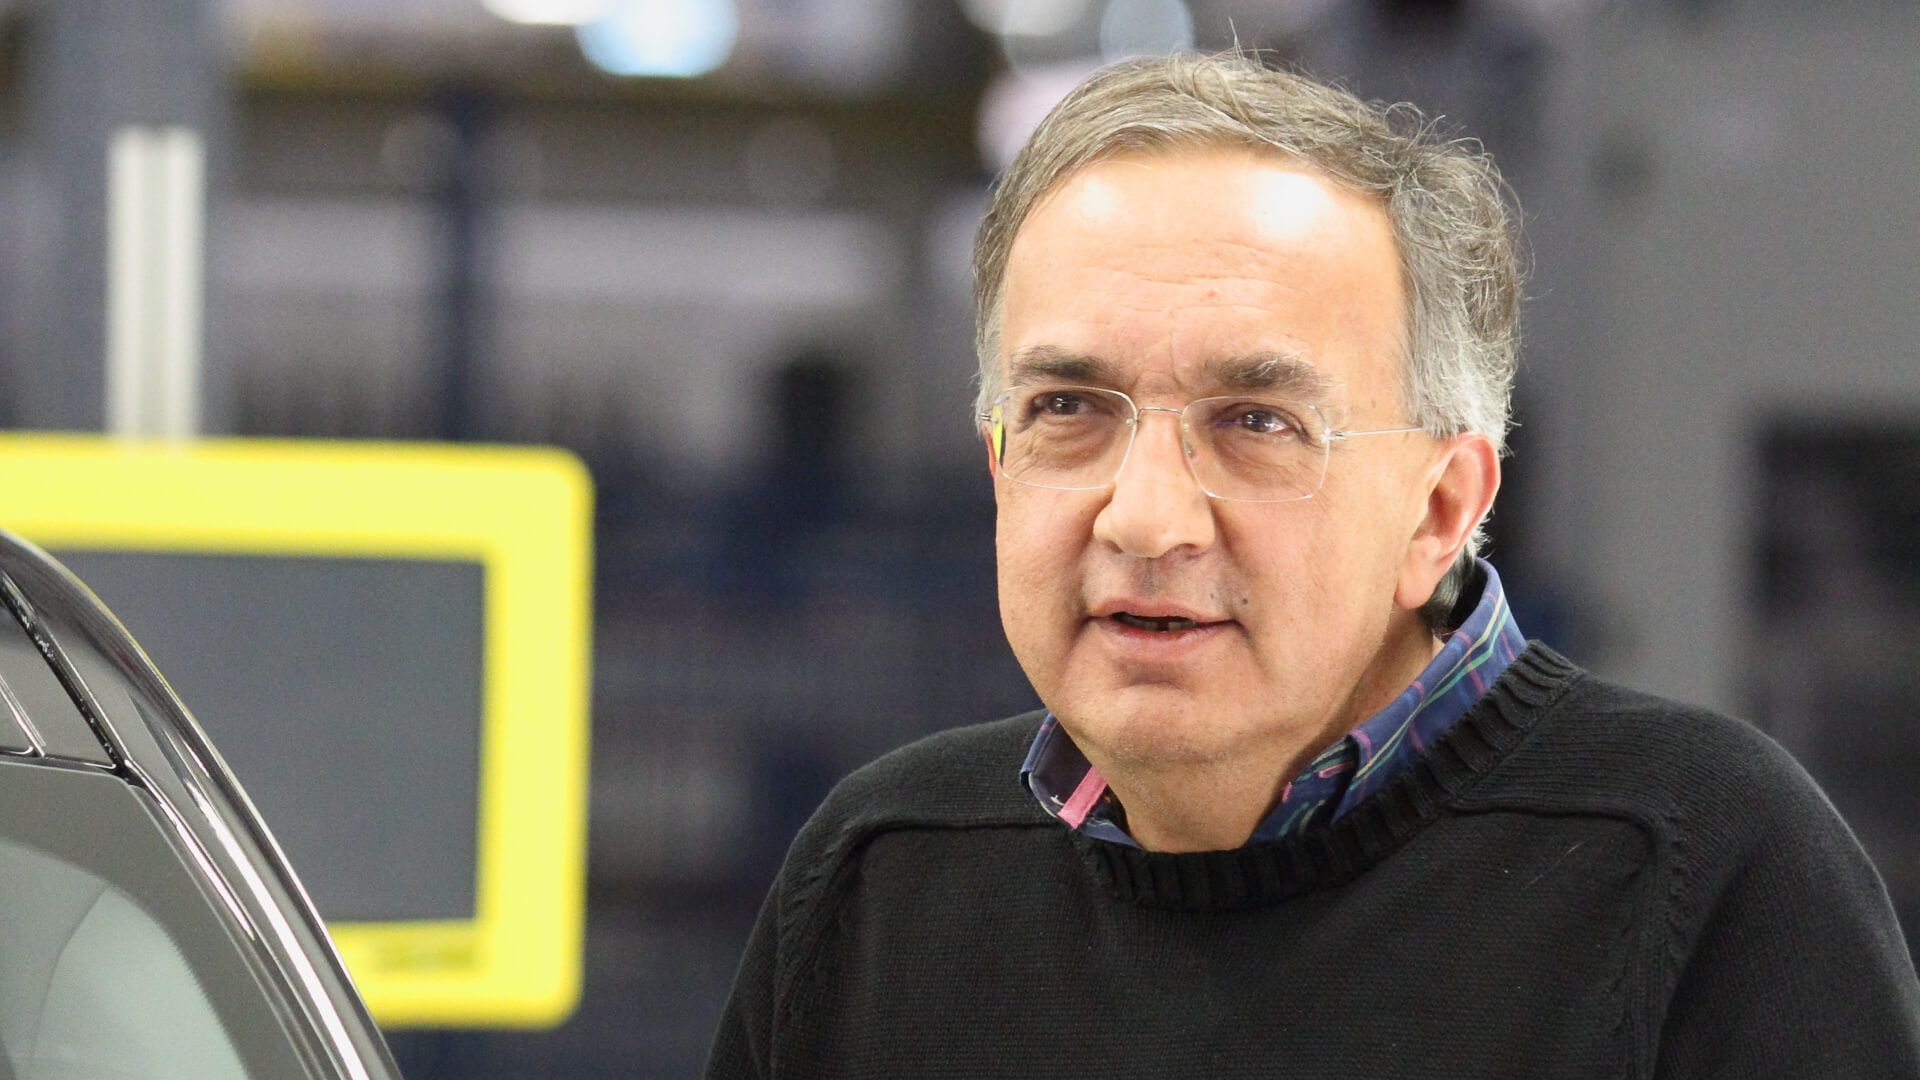 Fiat Chrysler CEO Sergio Marchionne